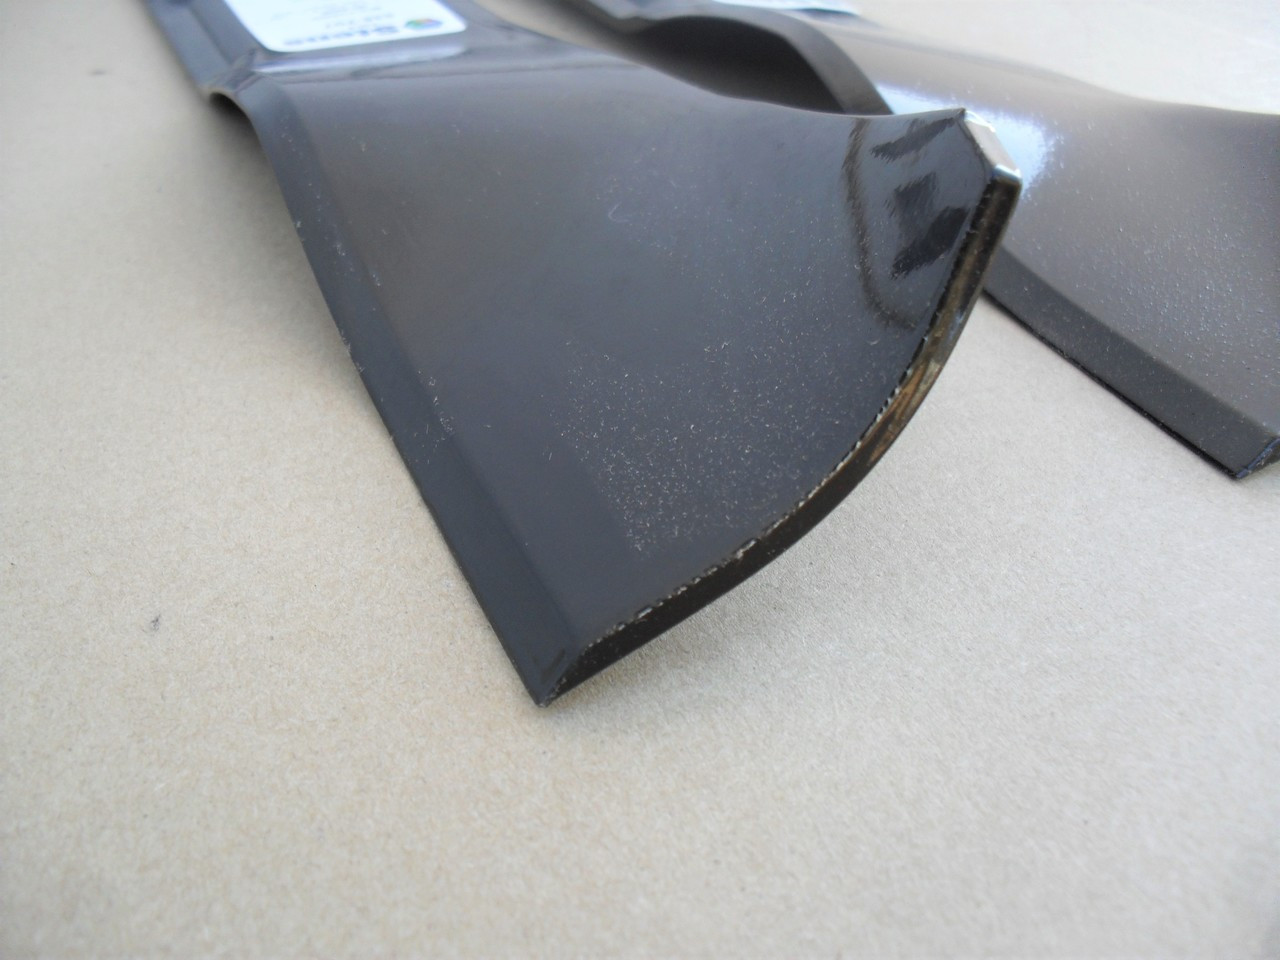 "Mulching Blades for Toro LX420, LX423, LX425, LX426, LX427, 13AX60RG744, 42"" Cut 112-0315, 1120315, 98022 Made In USA, Mulcher Blade Set of 2"